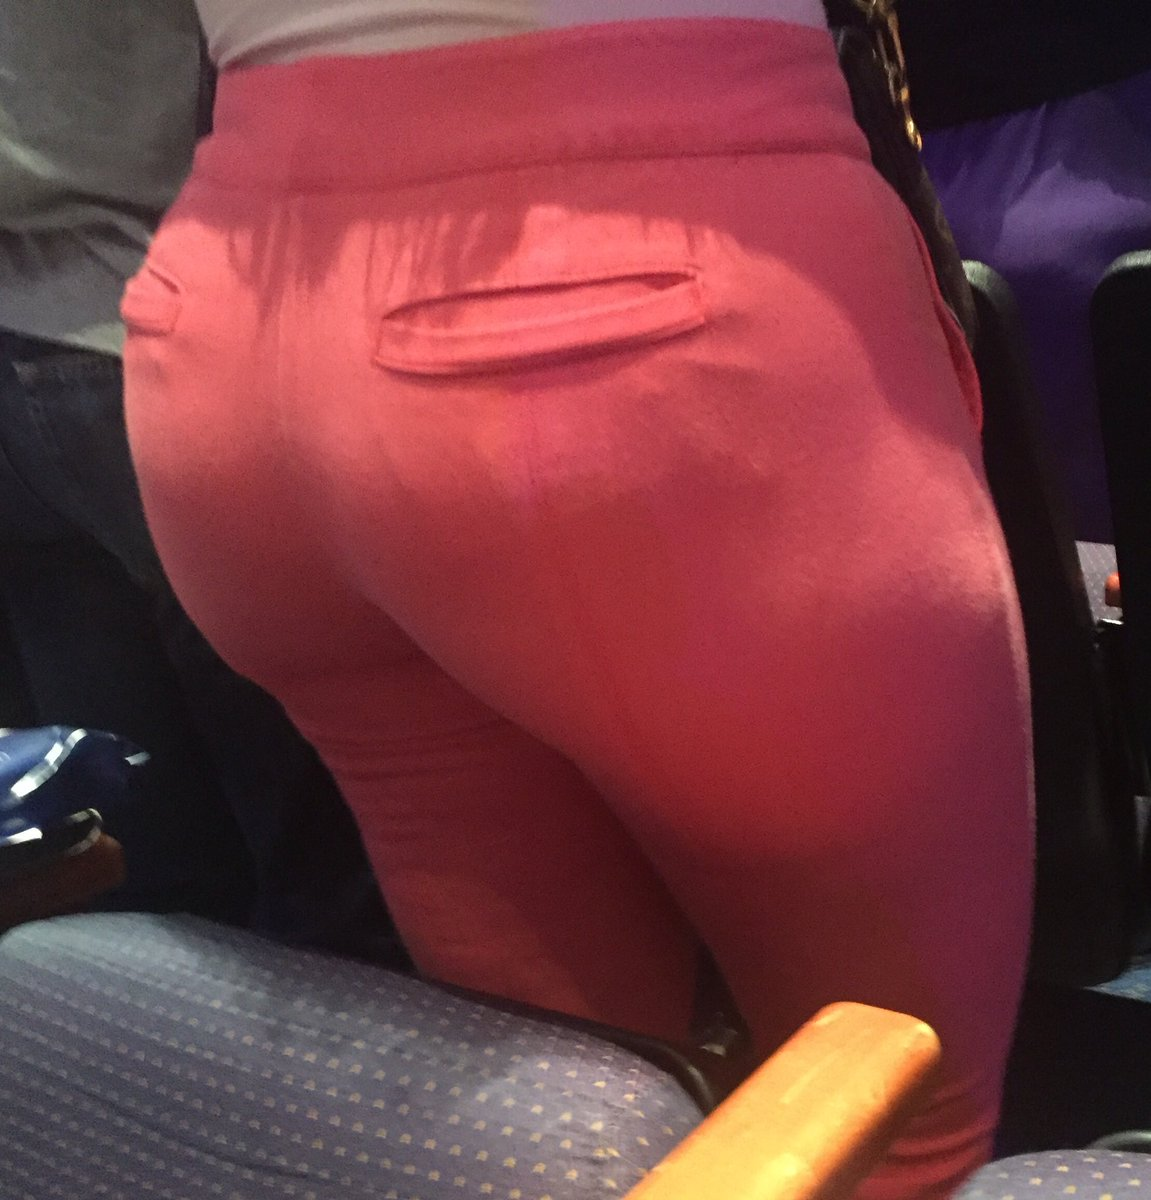 "10 Culos pillando culos on twitter: ""big ass 😈 @sexysights @ctangas"